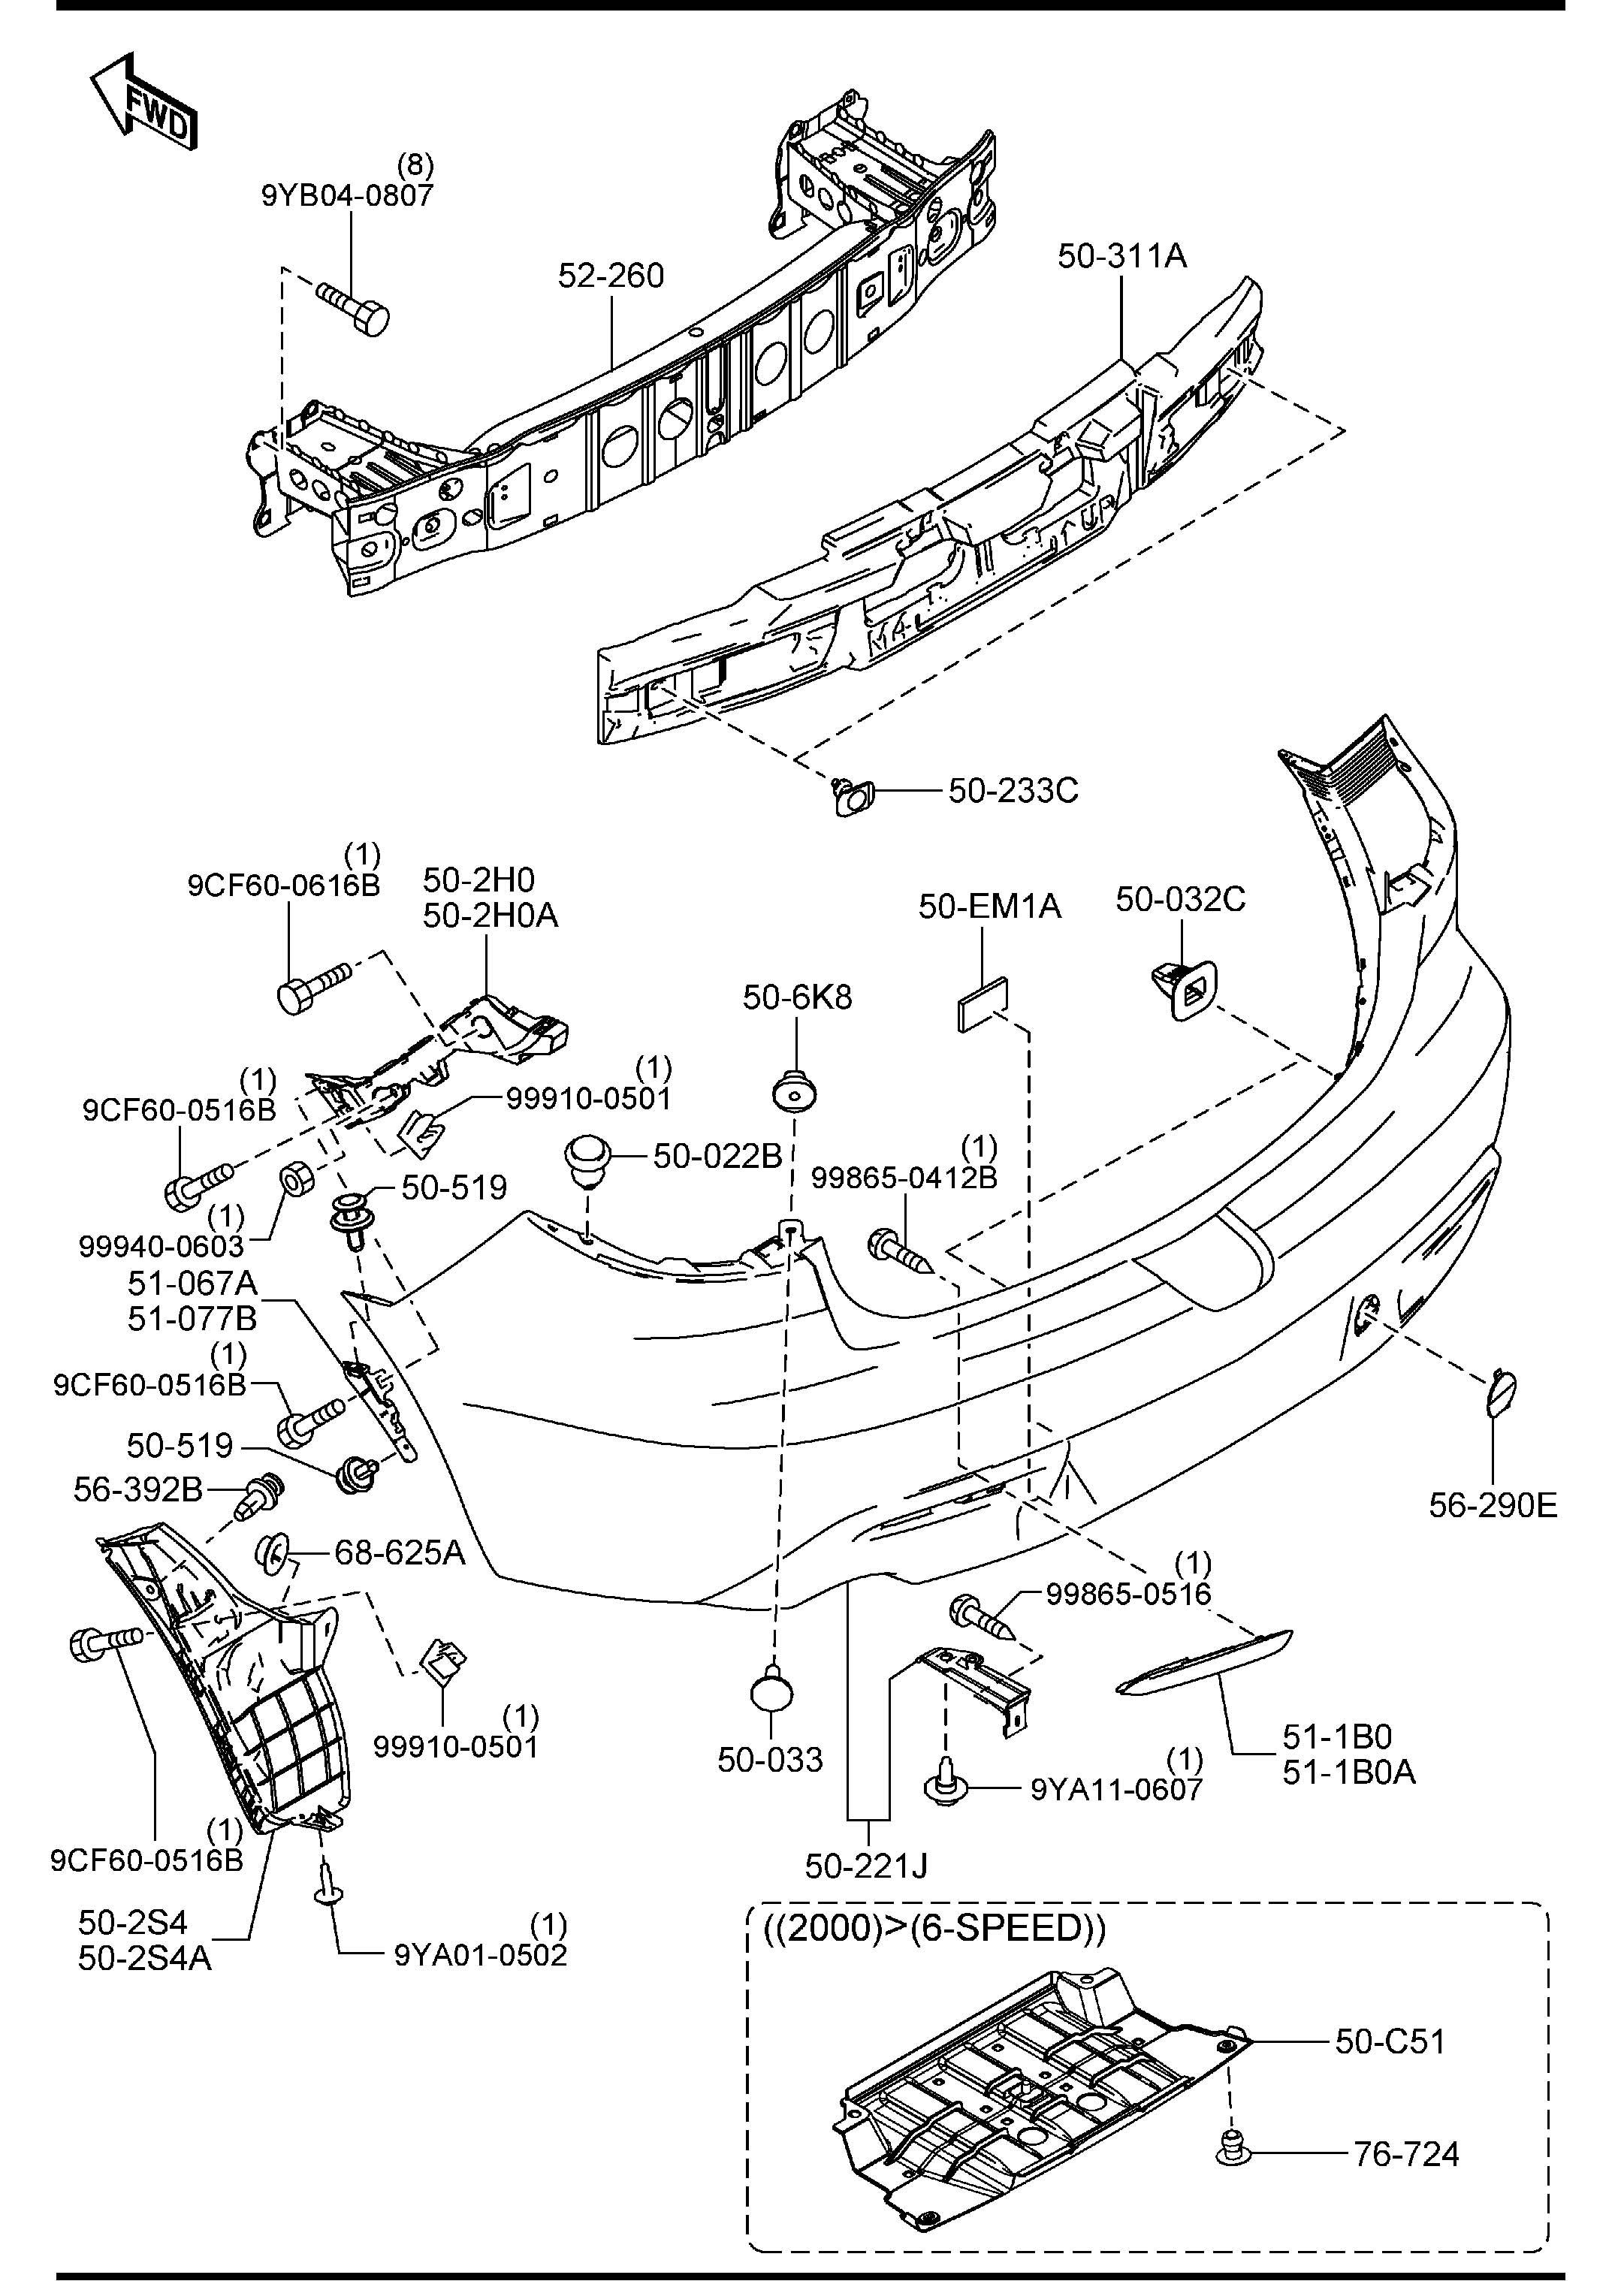 bentley turbo r fuse box